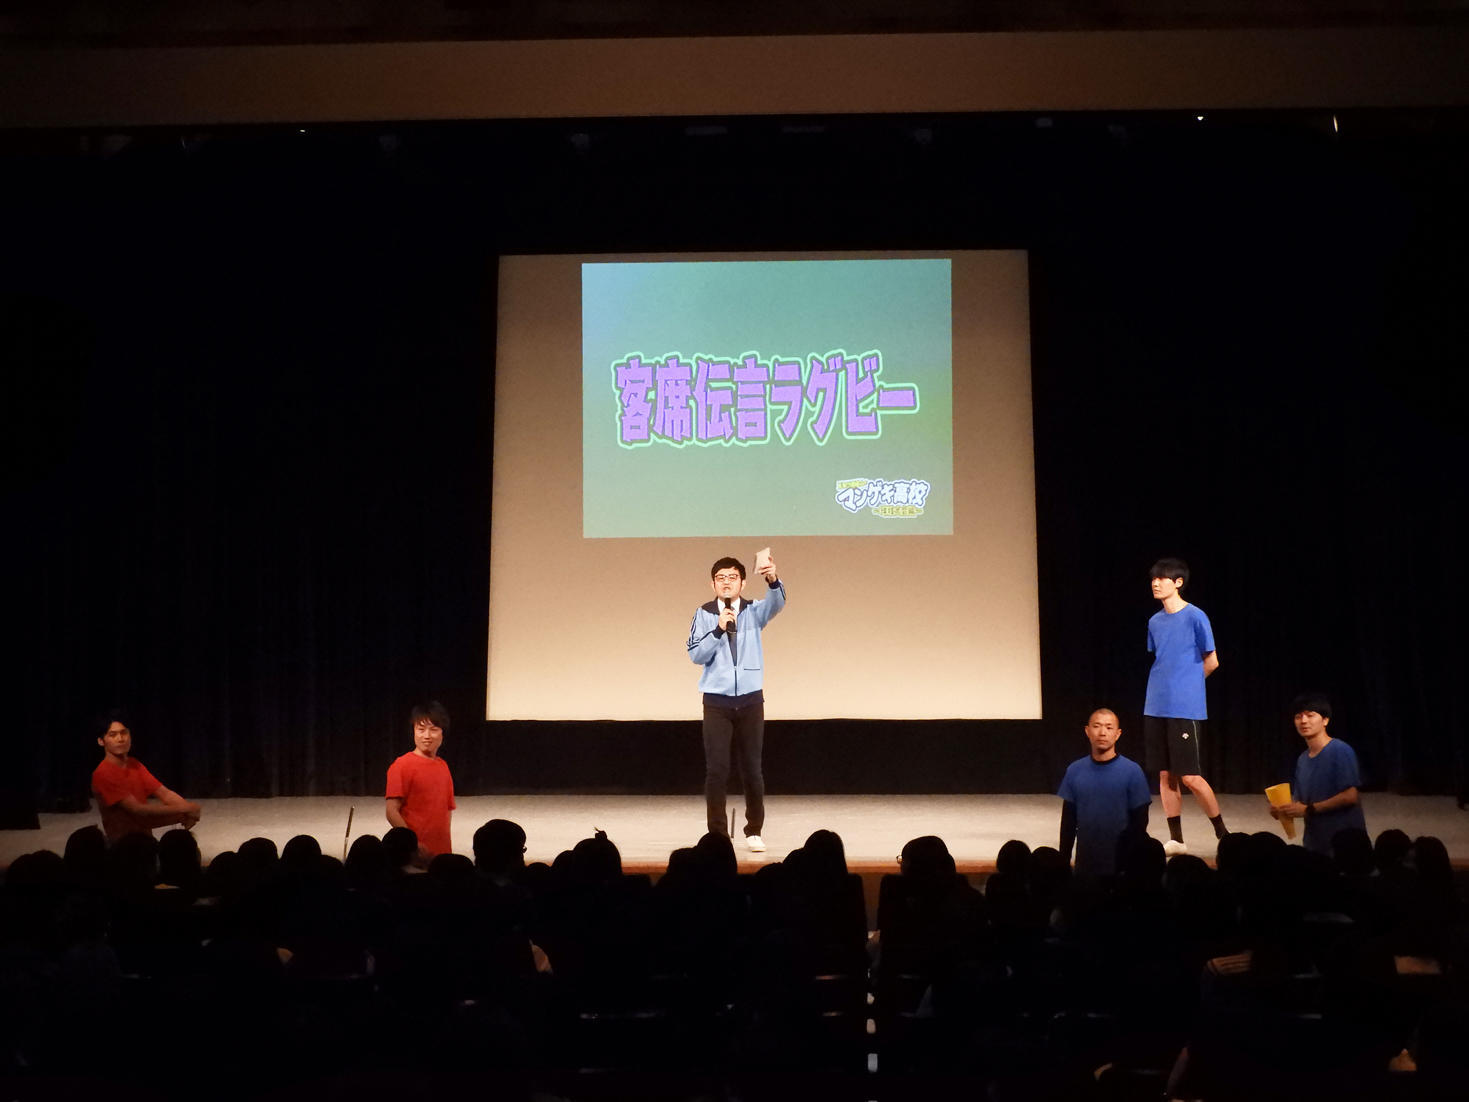 http://news.yoshimoto.co.jp/20180404103926-92385330935c3c359cf79bacc9e38cf1c442bee0.jpg